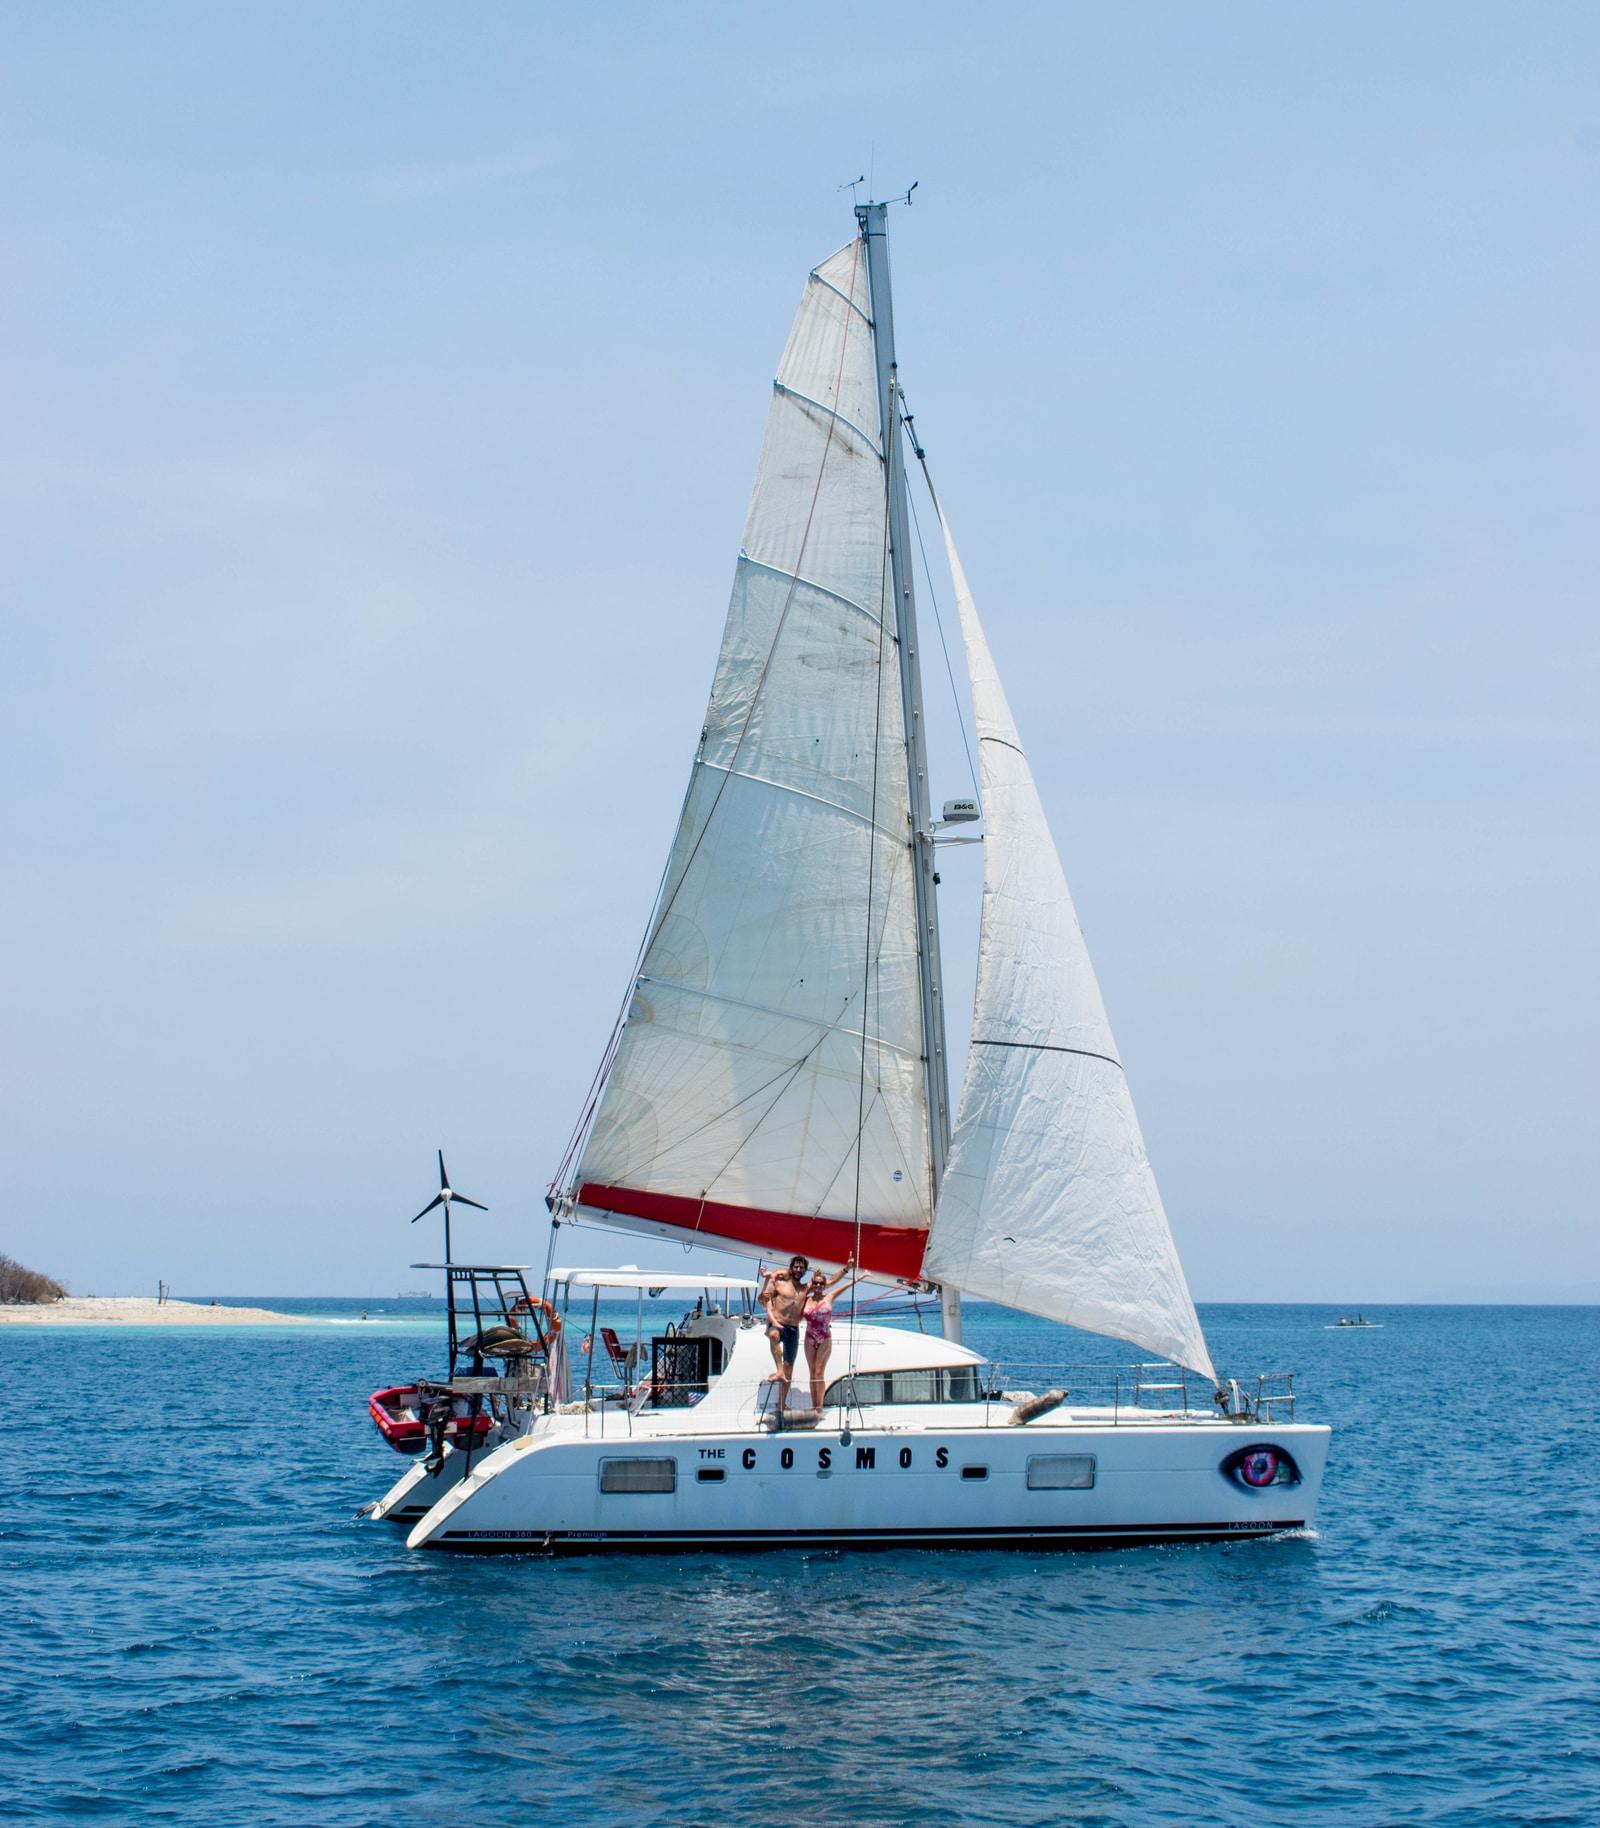 Live aboard a sailboat